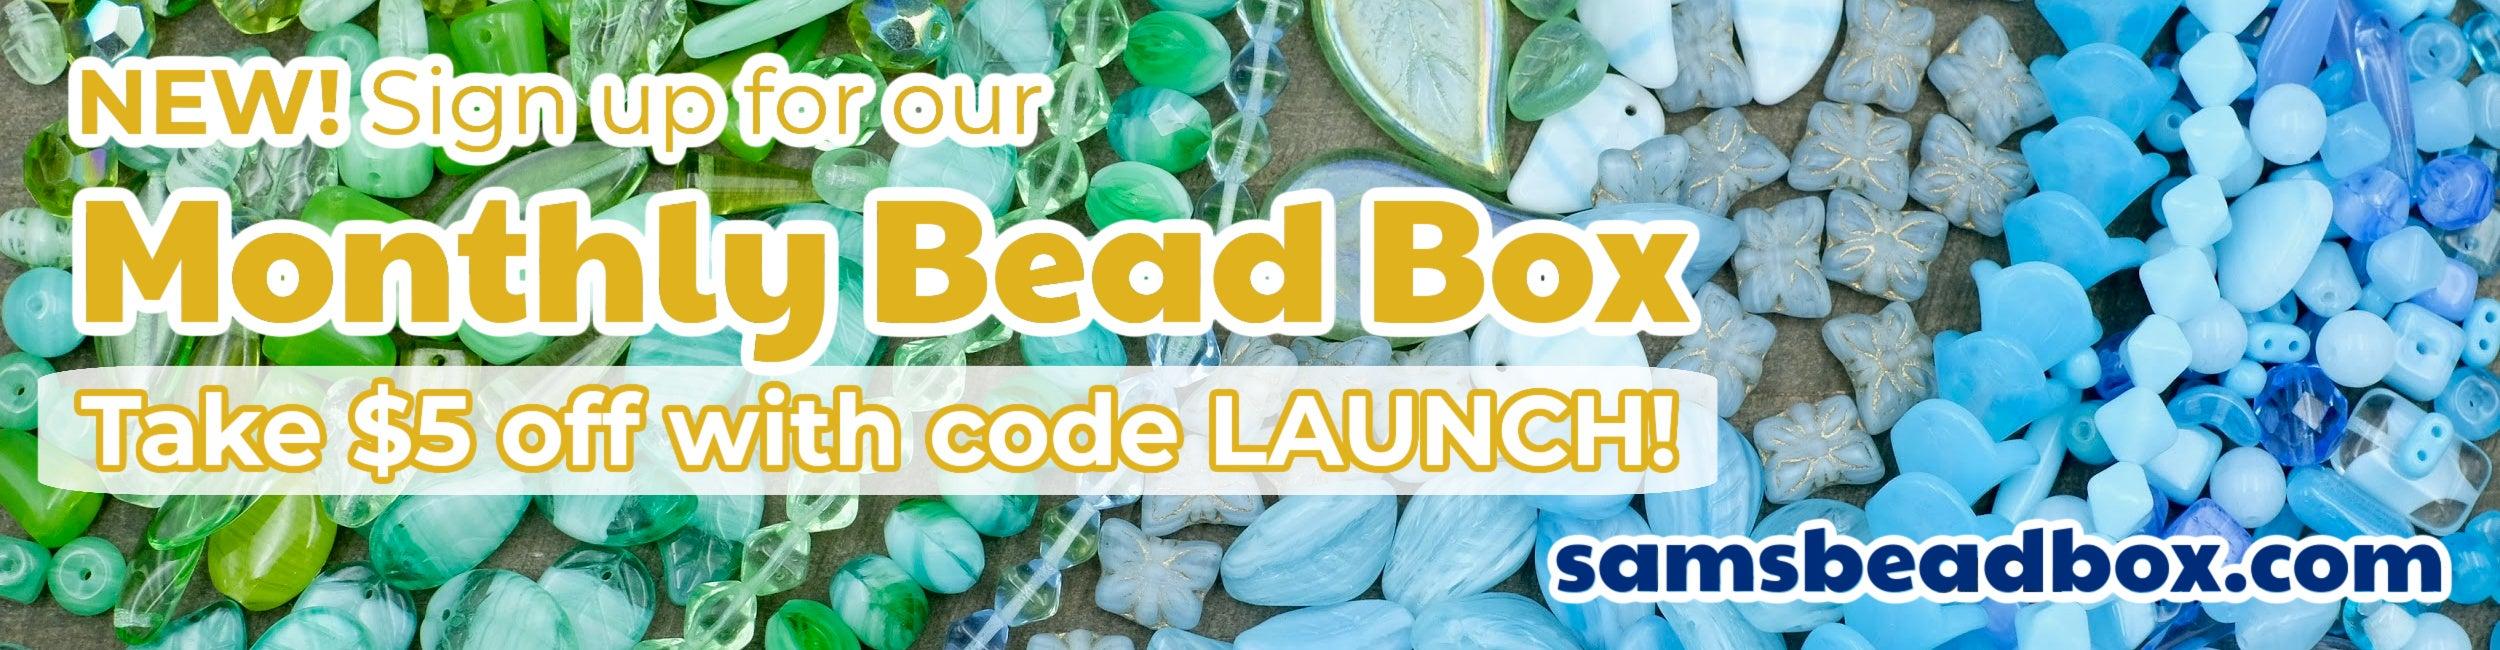 Sam's Bead Box is here!